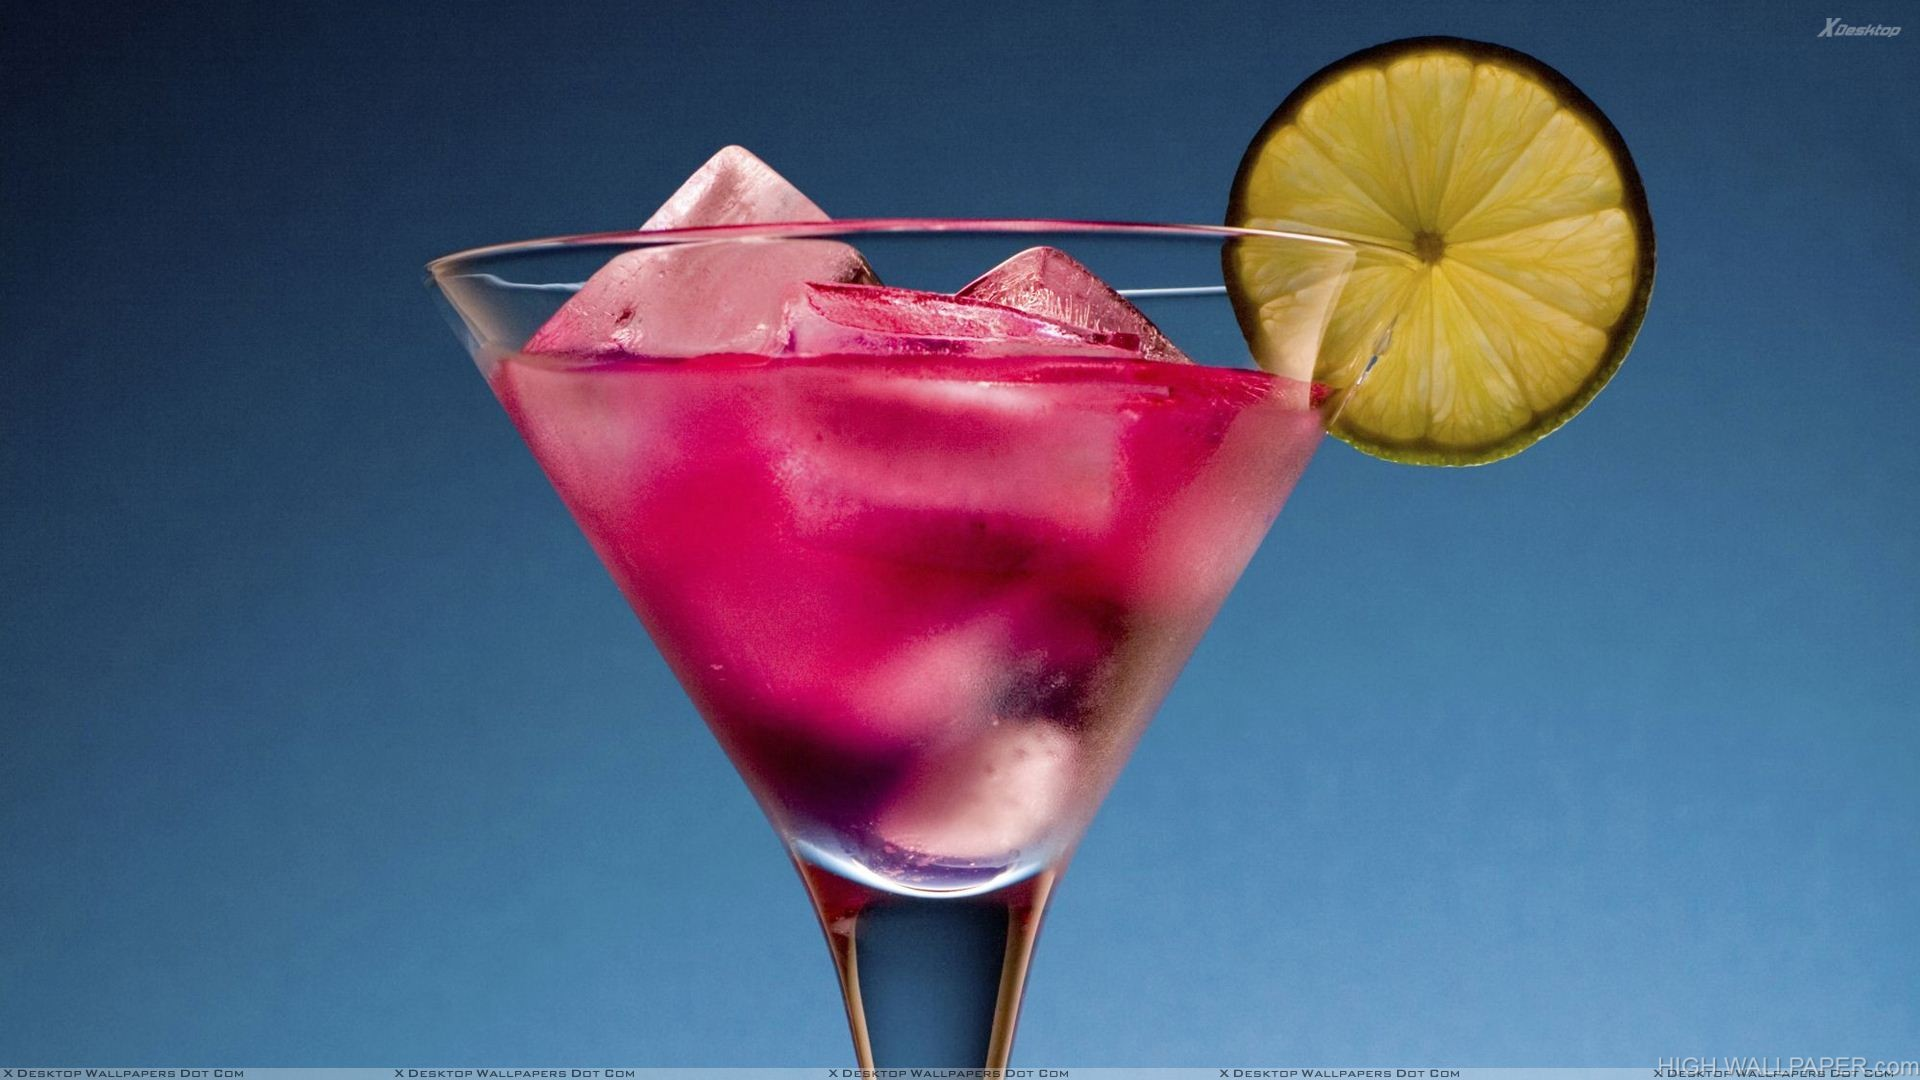 Purple Drink In Glass With Lemon